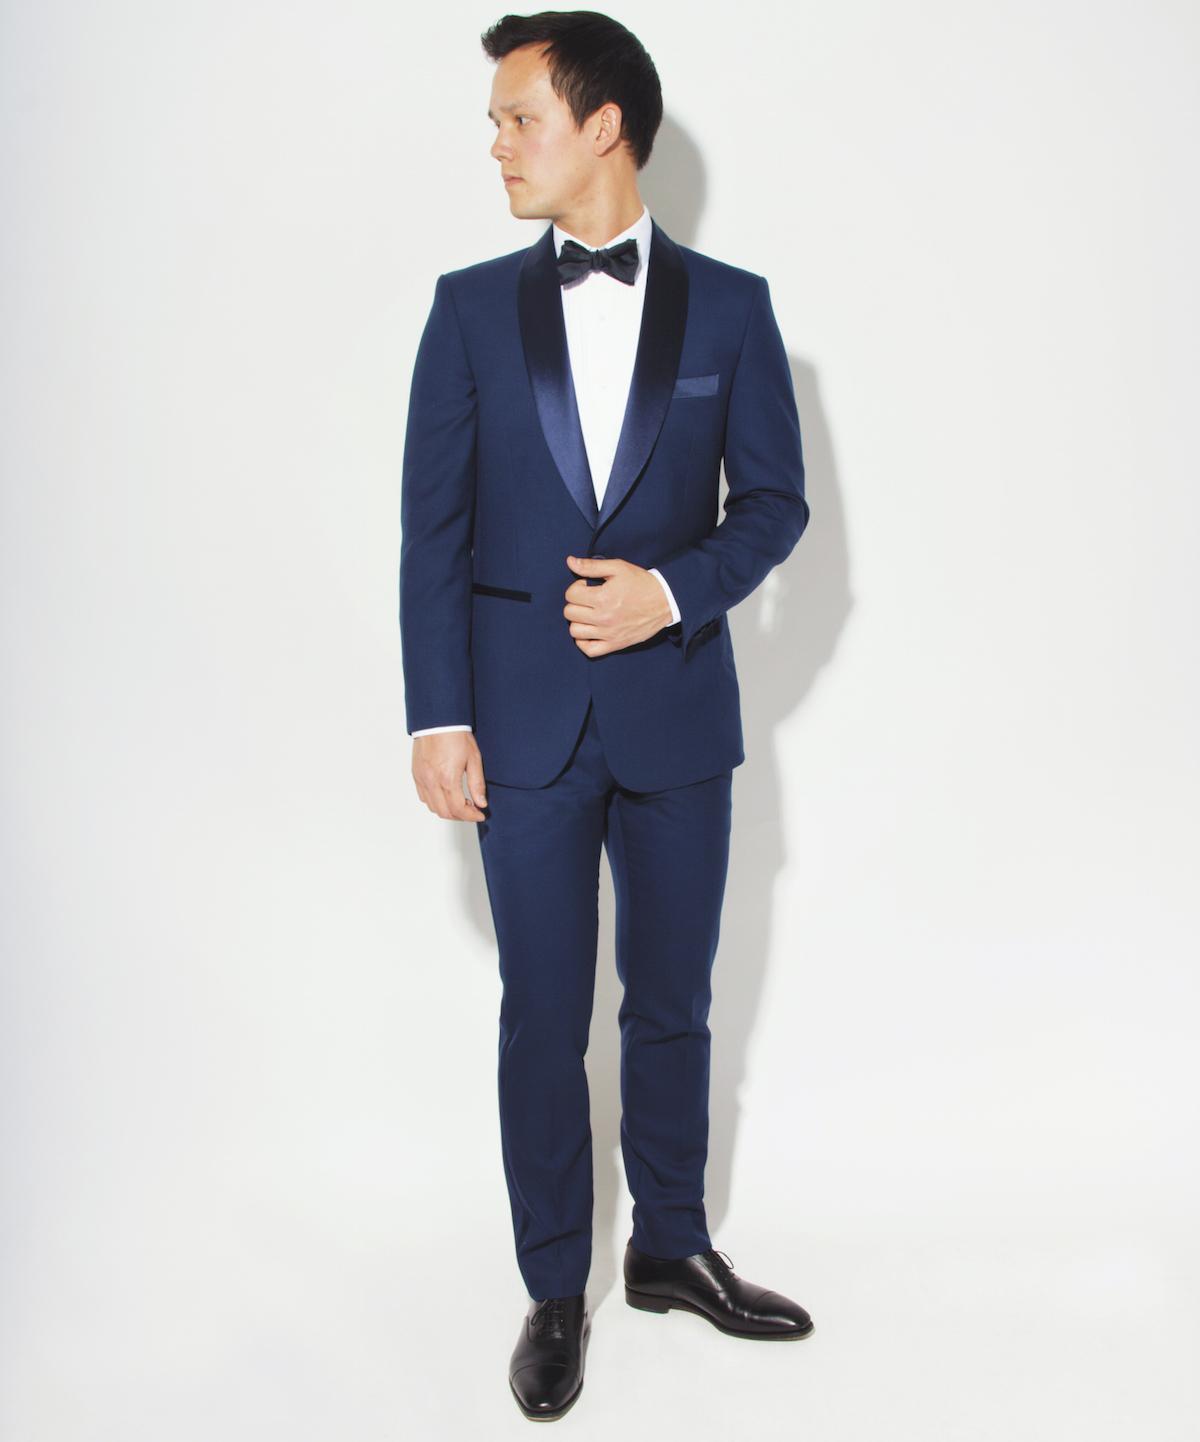 Blank Labels New Navy Blue Shawl Tuxedo